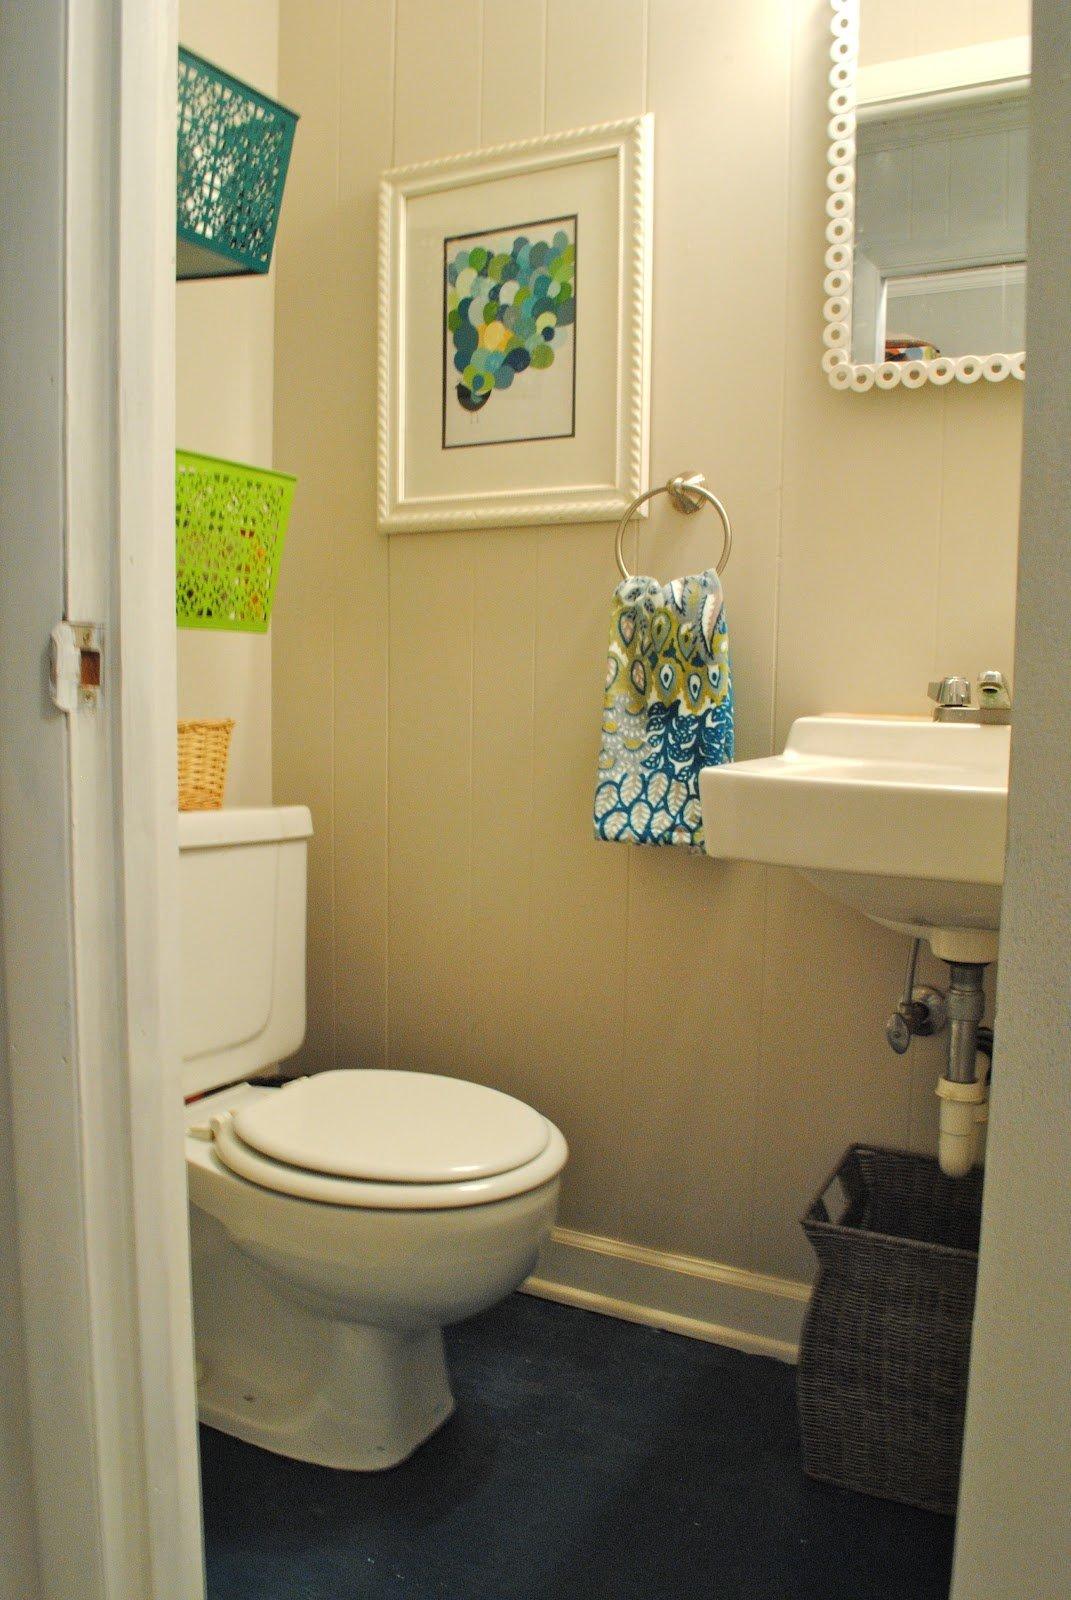 Фото дизайн комнаты для унитаза